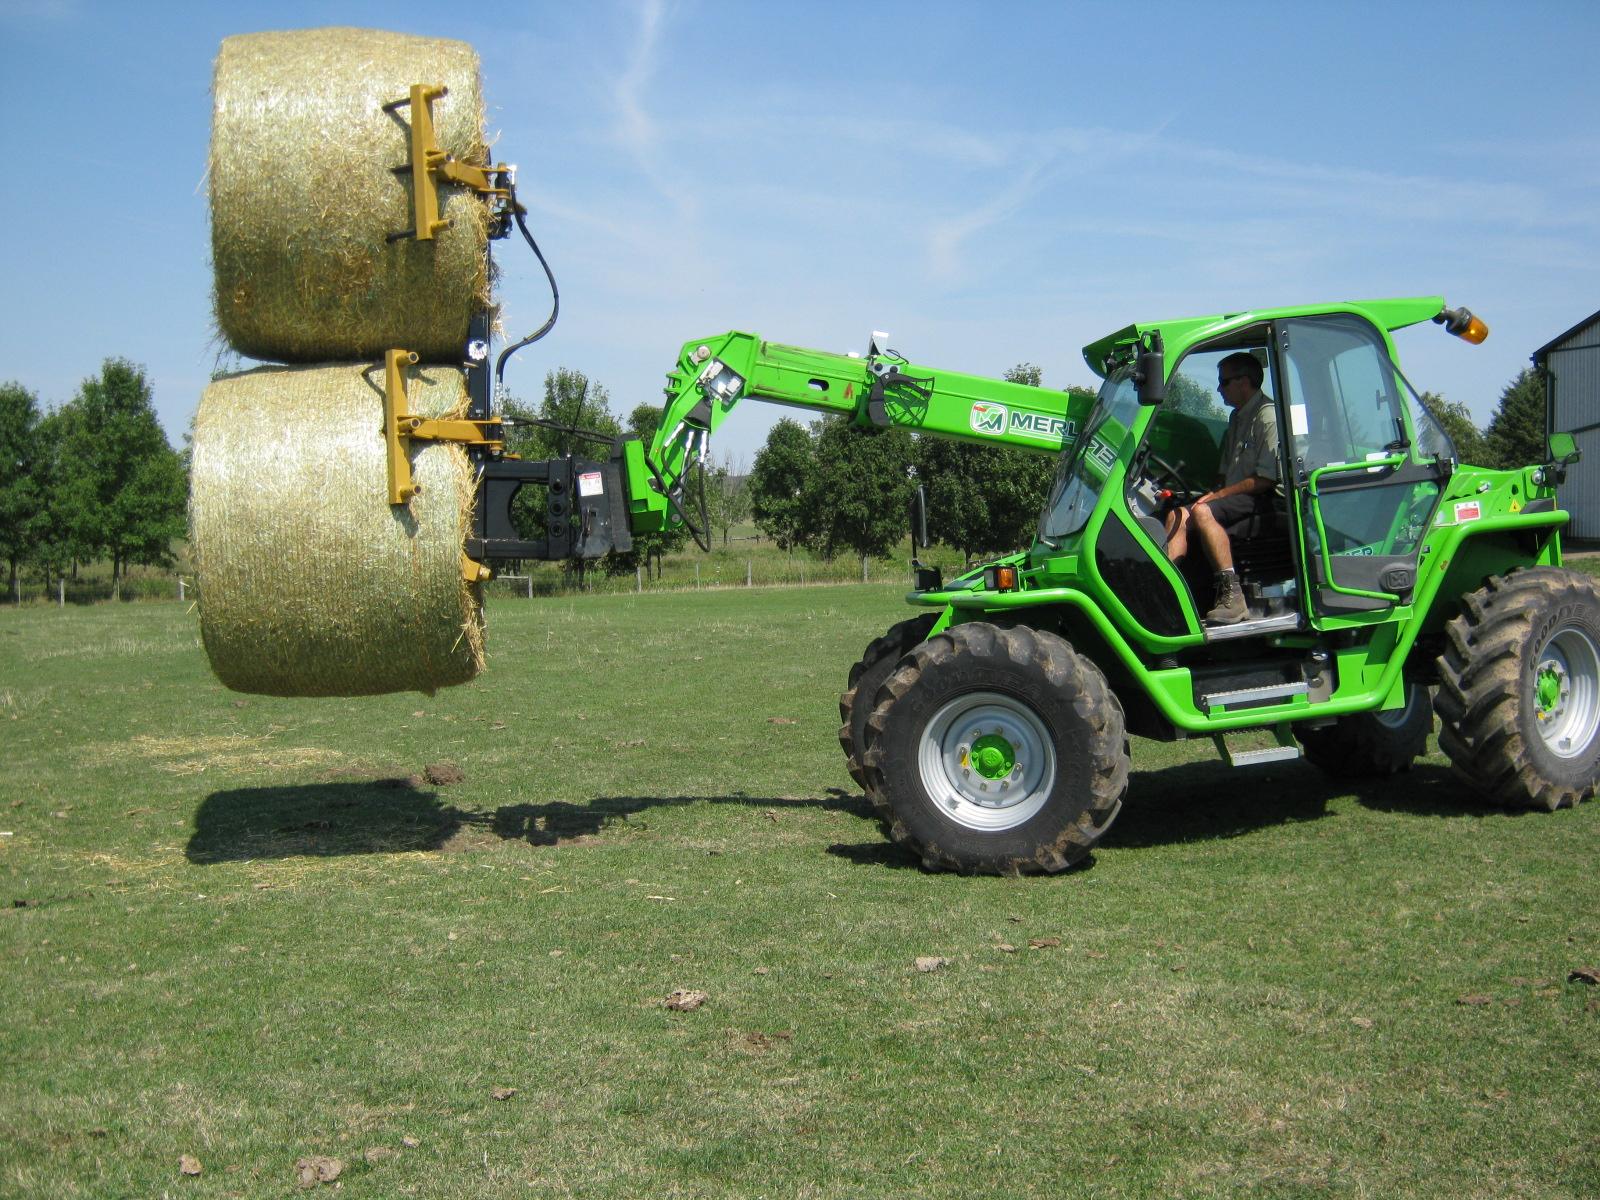 Large Double Bale Grabber - MLBG2